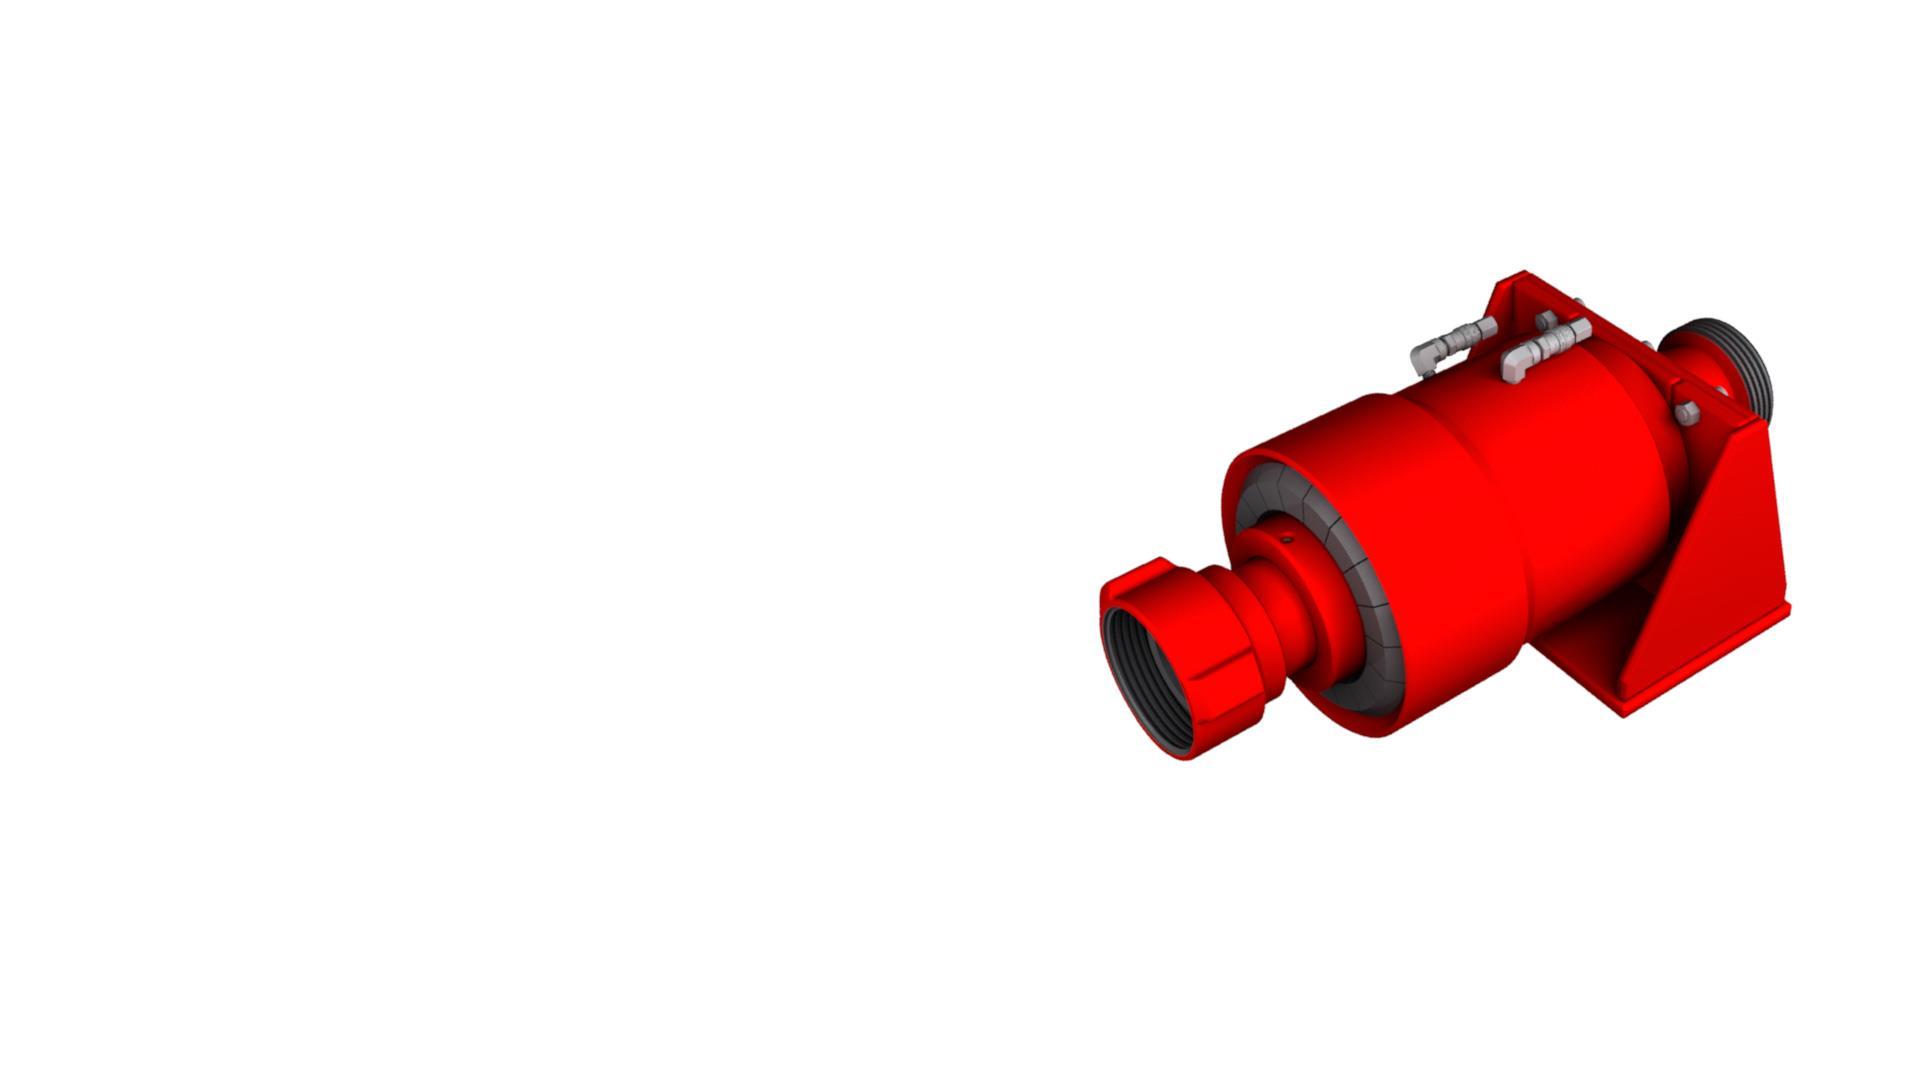 Render of Pressure Control Accessories Quick Disconnect